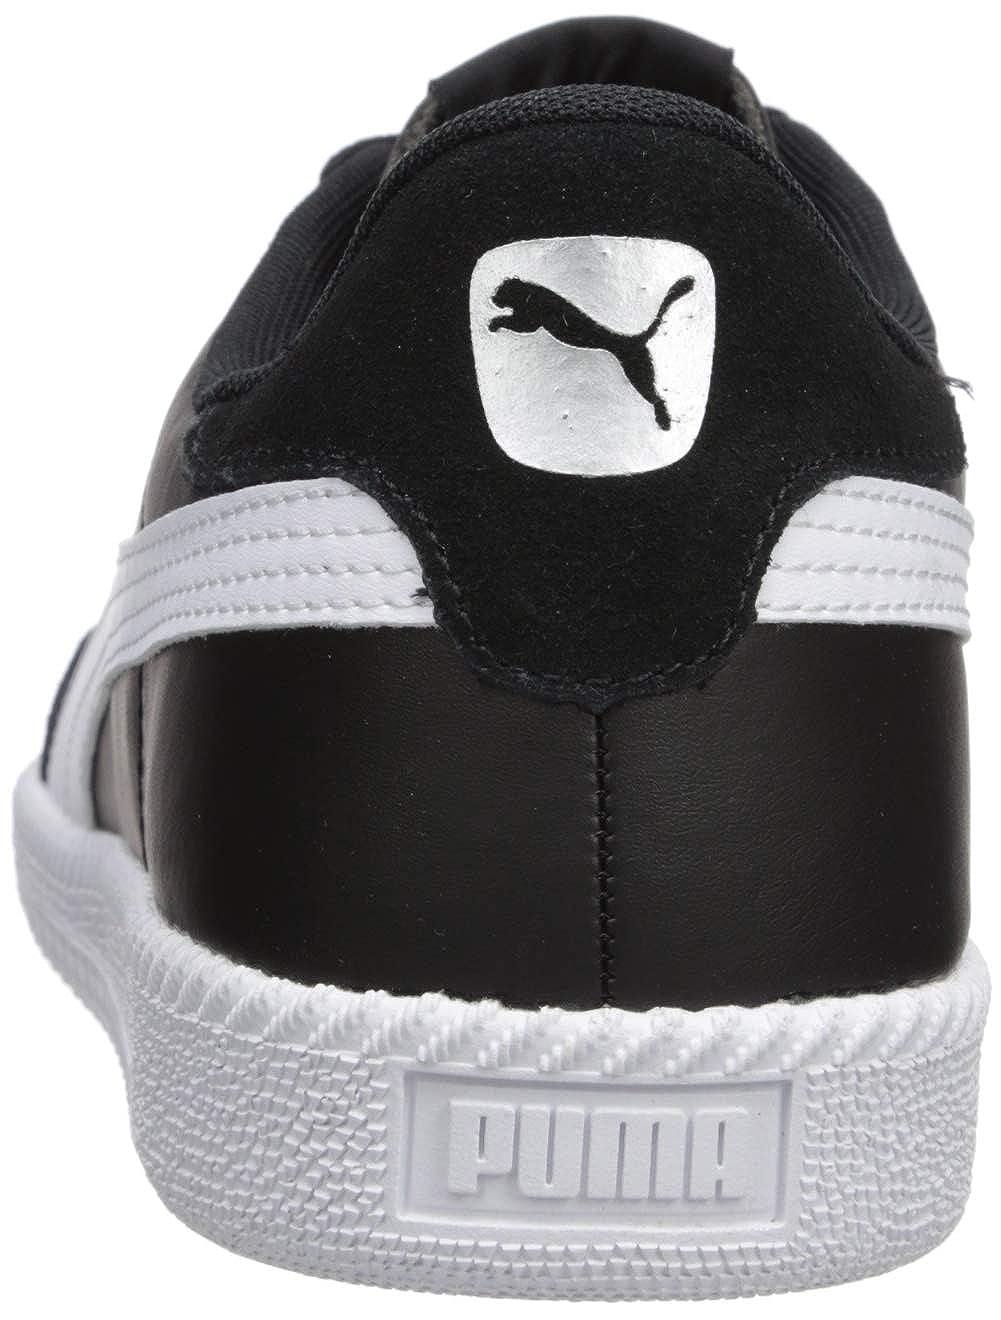 Puma - - - Herren Astro Cup Sl Schuhe 60bb0f